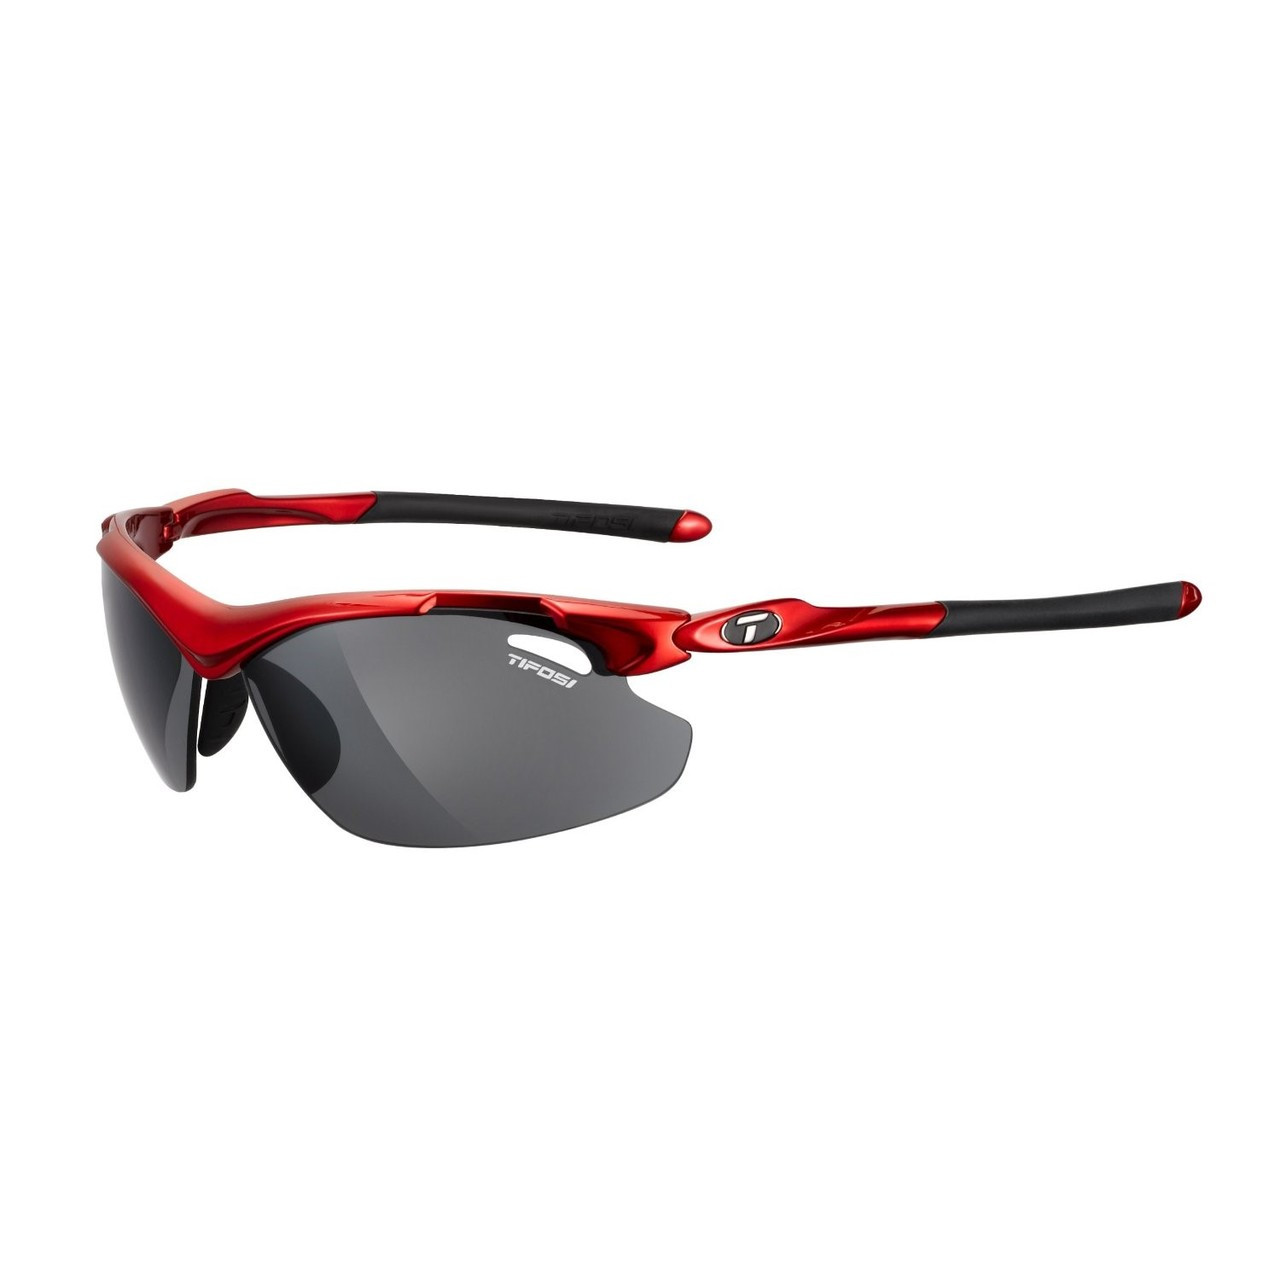 Tifosi Tyrant 2.0 Sunglasses with Interchangeable Lens - 2019 price